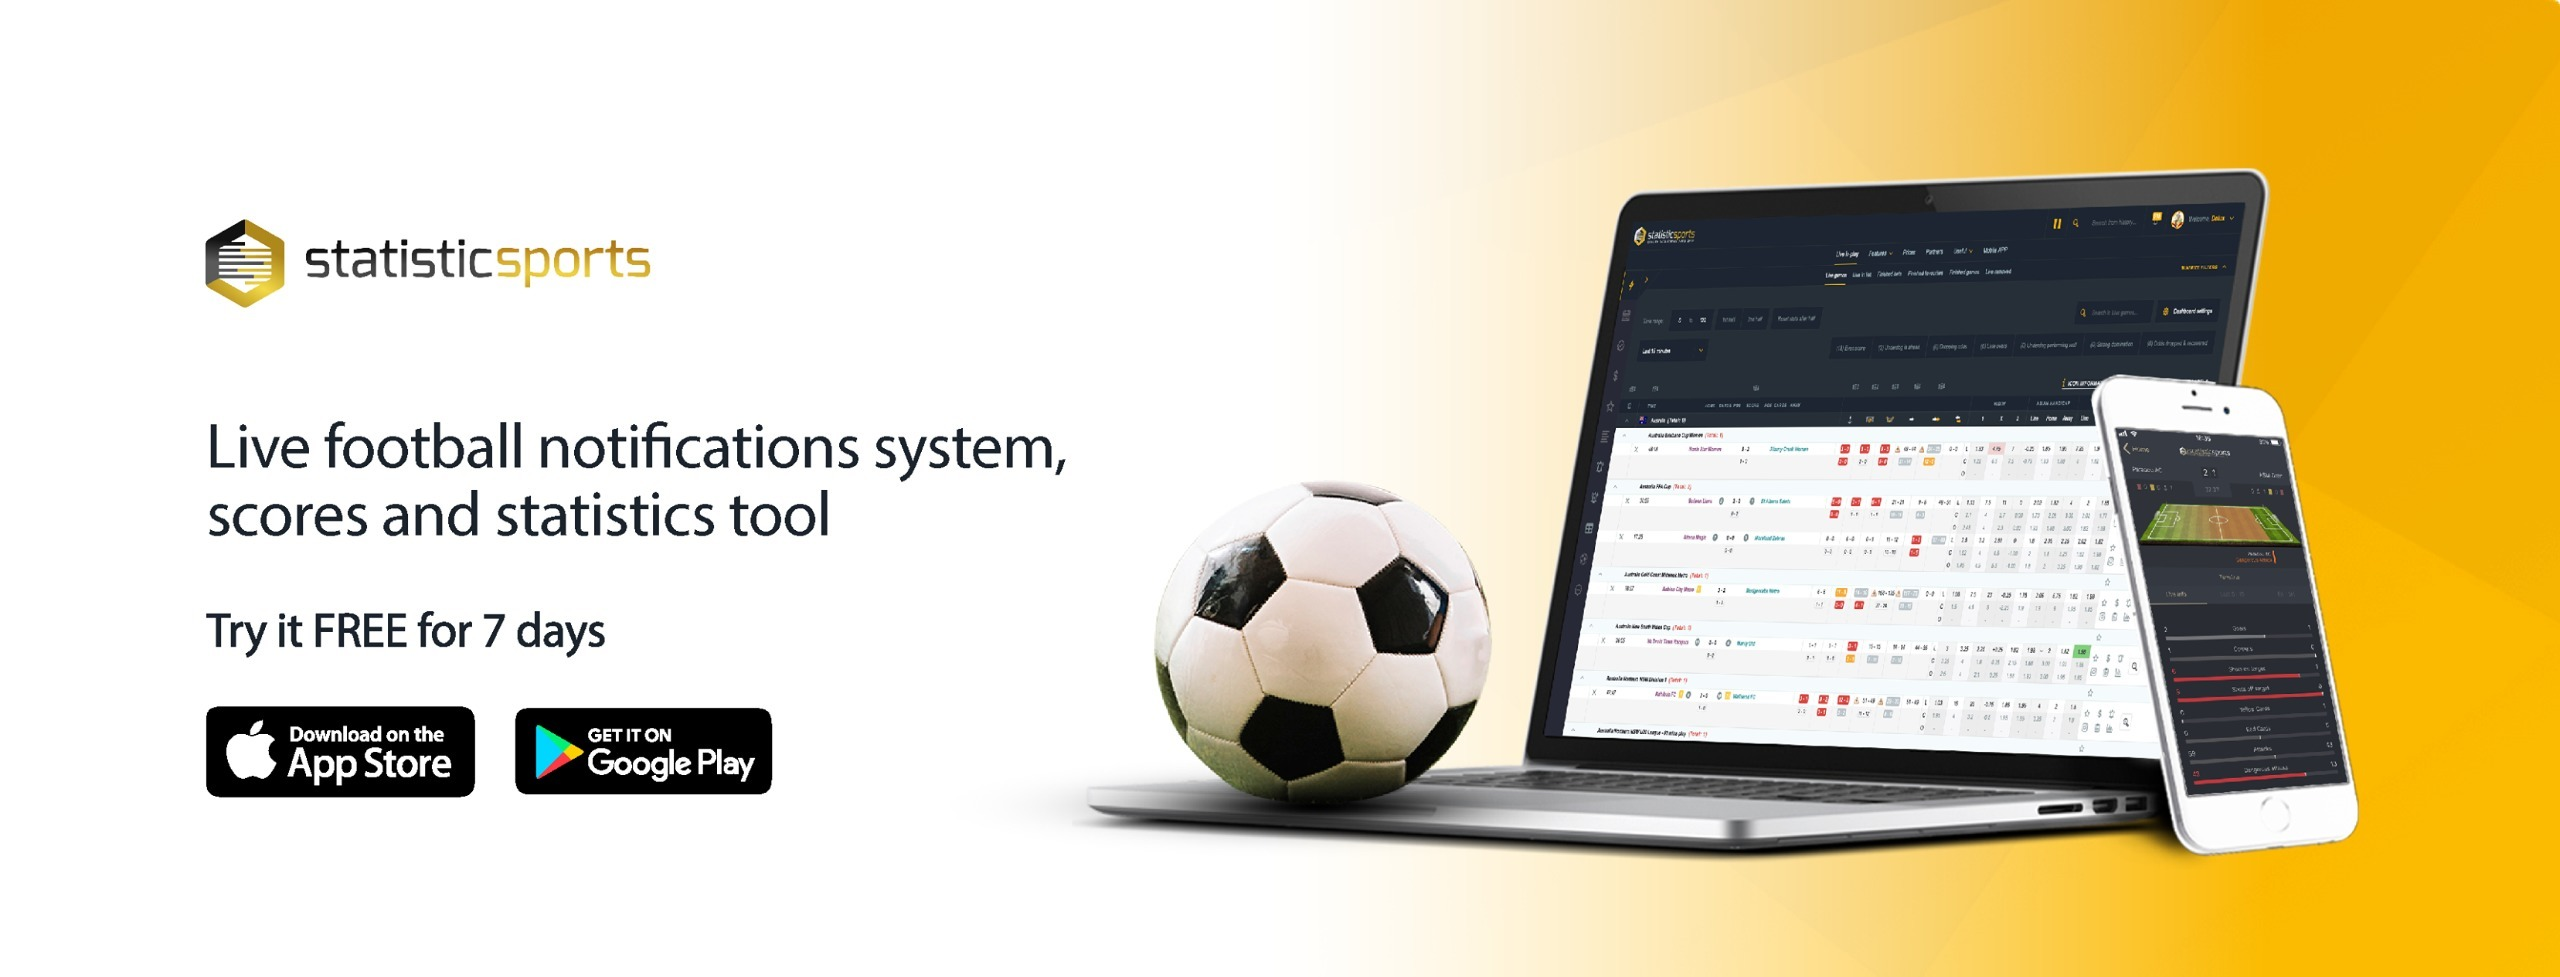 StatisticSports (@statisticsports) Cover Image